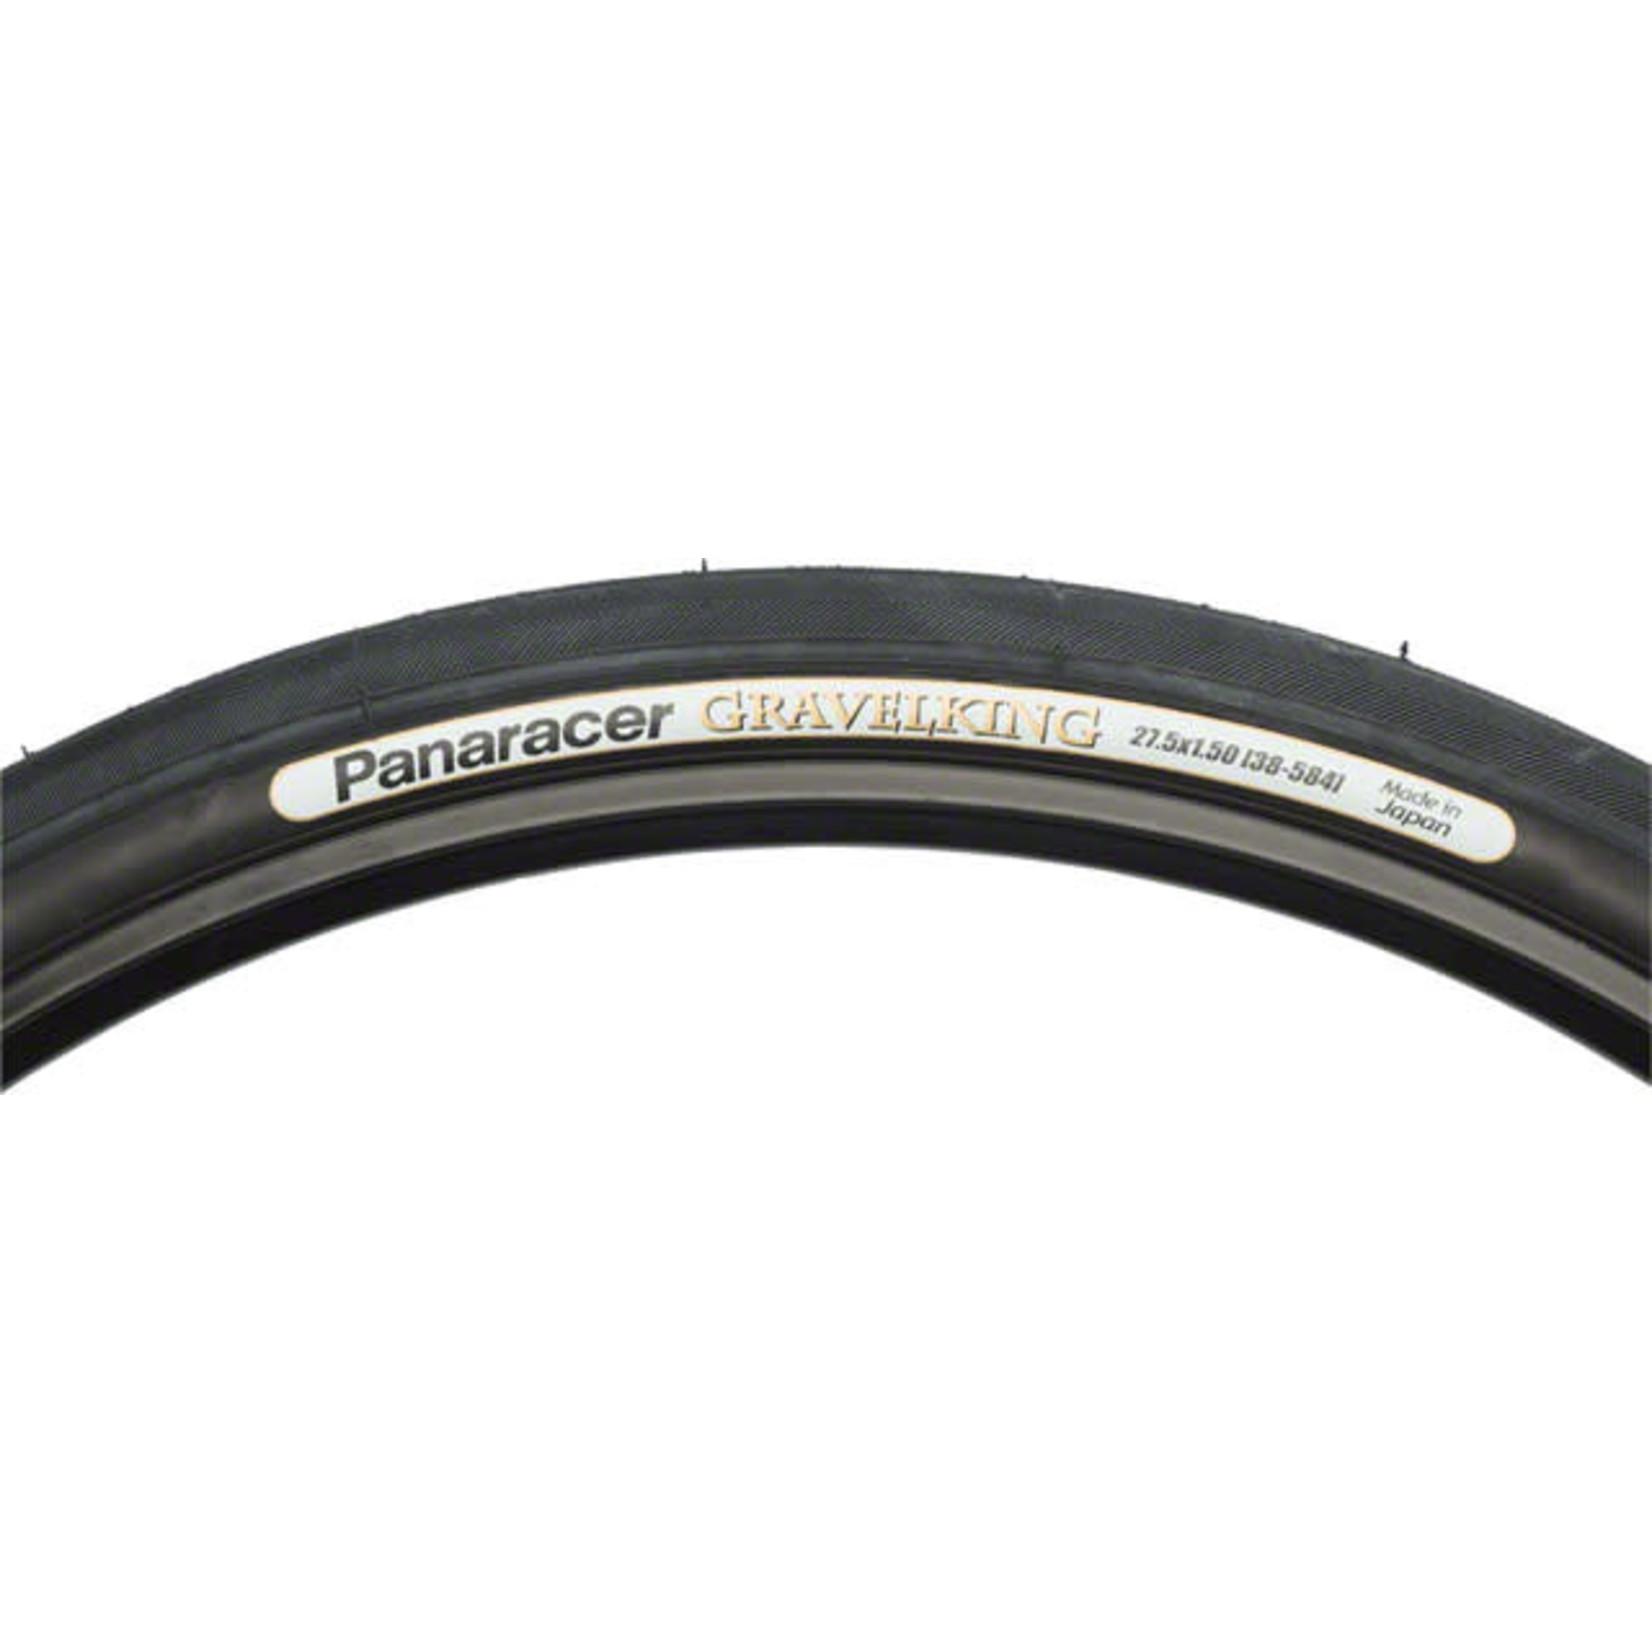 "Panaracer Panaracer GravelKing 27.5 x 1.5"" (650B x 38) Folding Tire Nearly Slick Tread, Black"